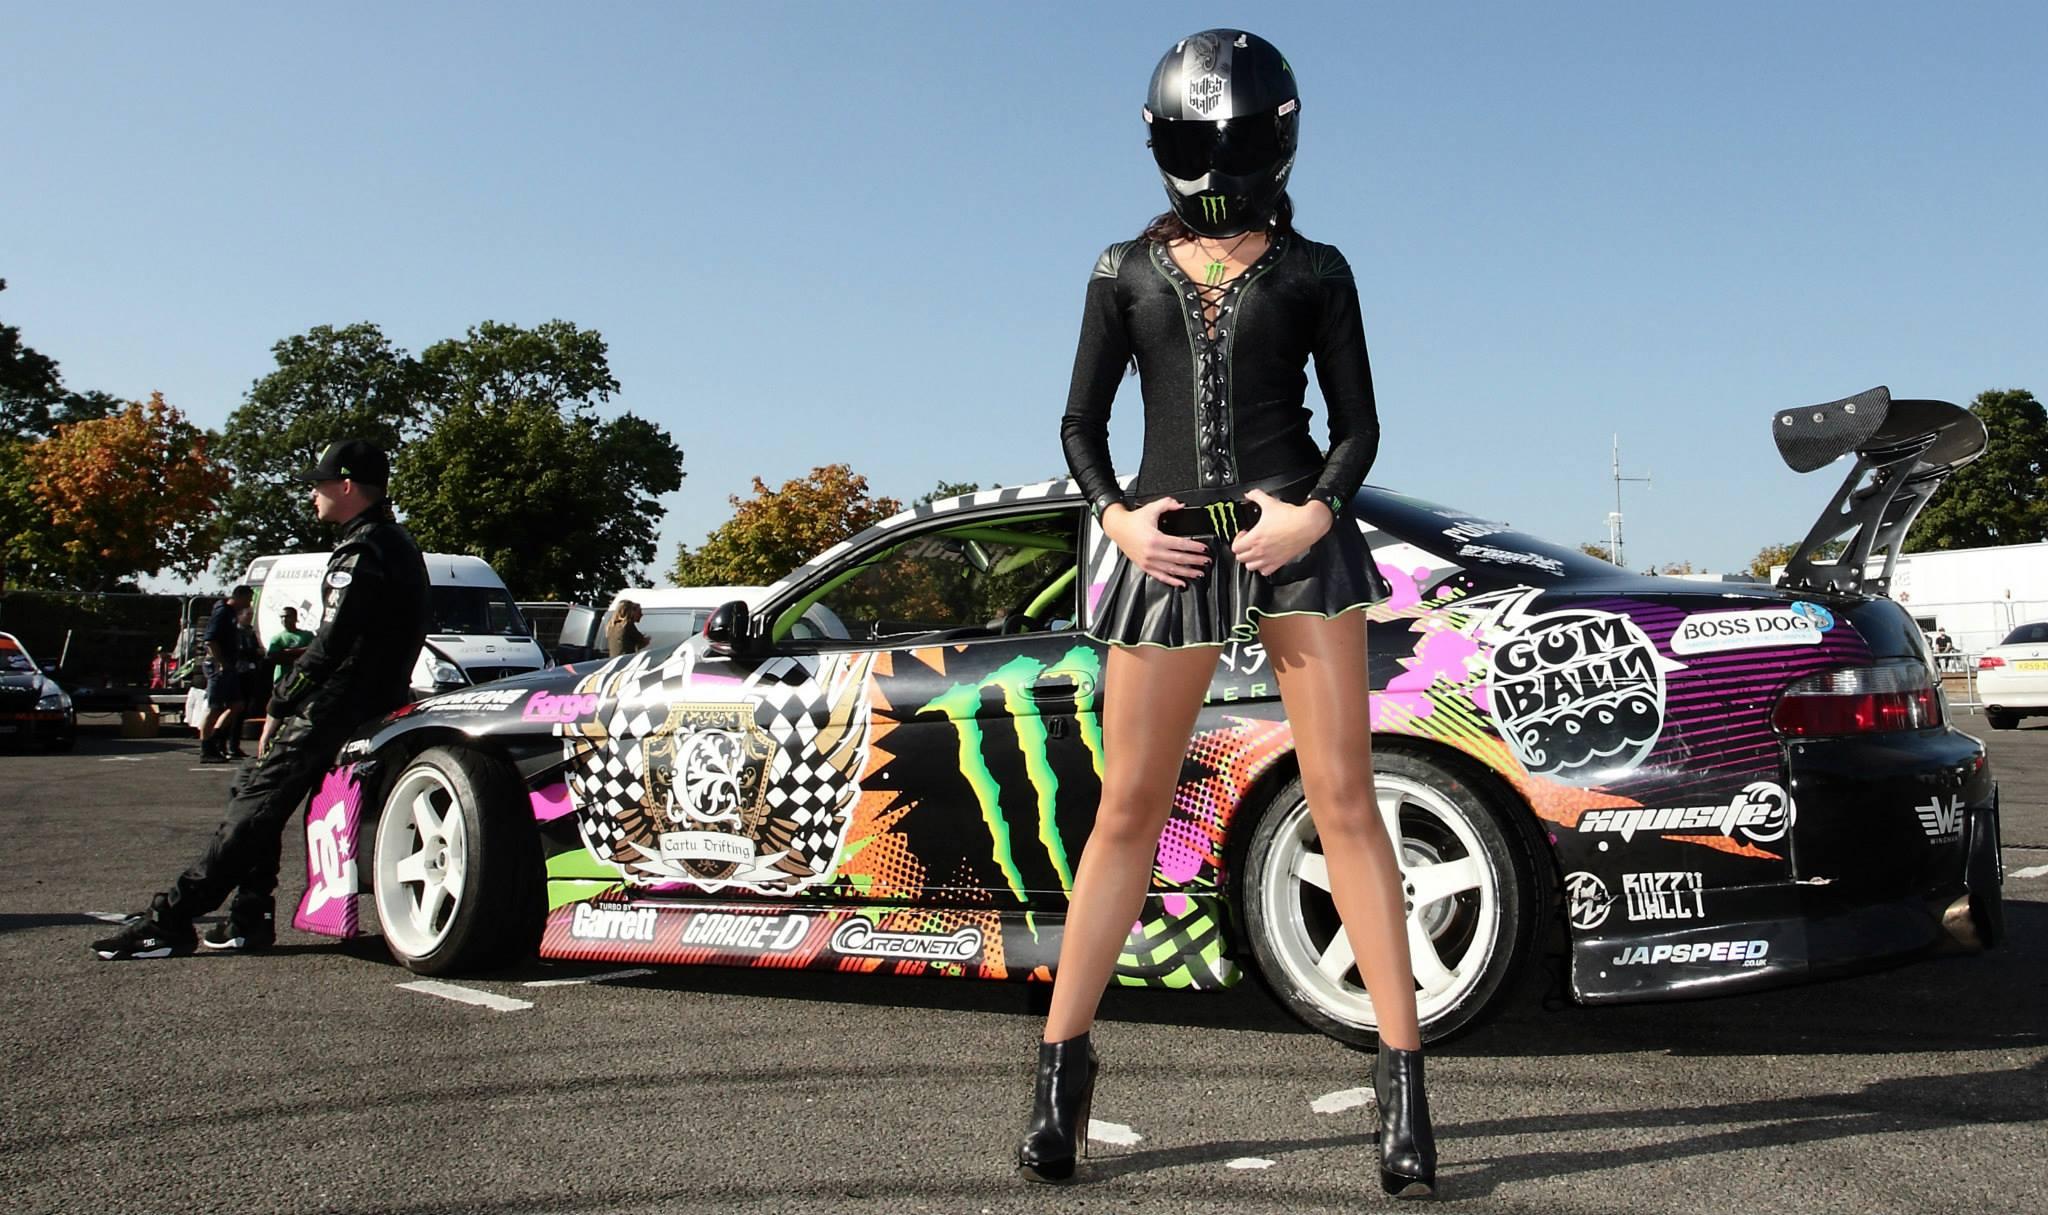 engine-drift-girls-nude-chicks